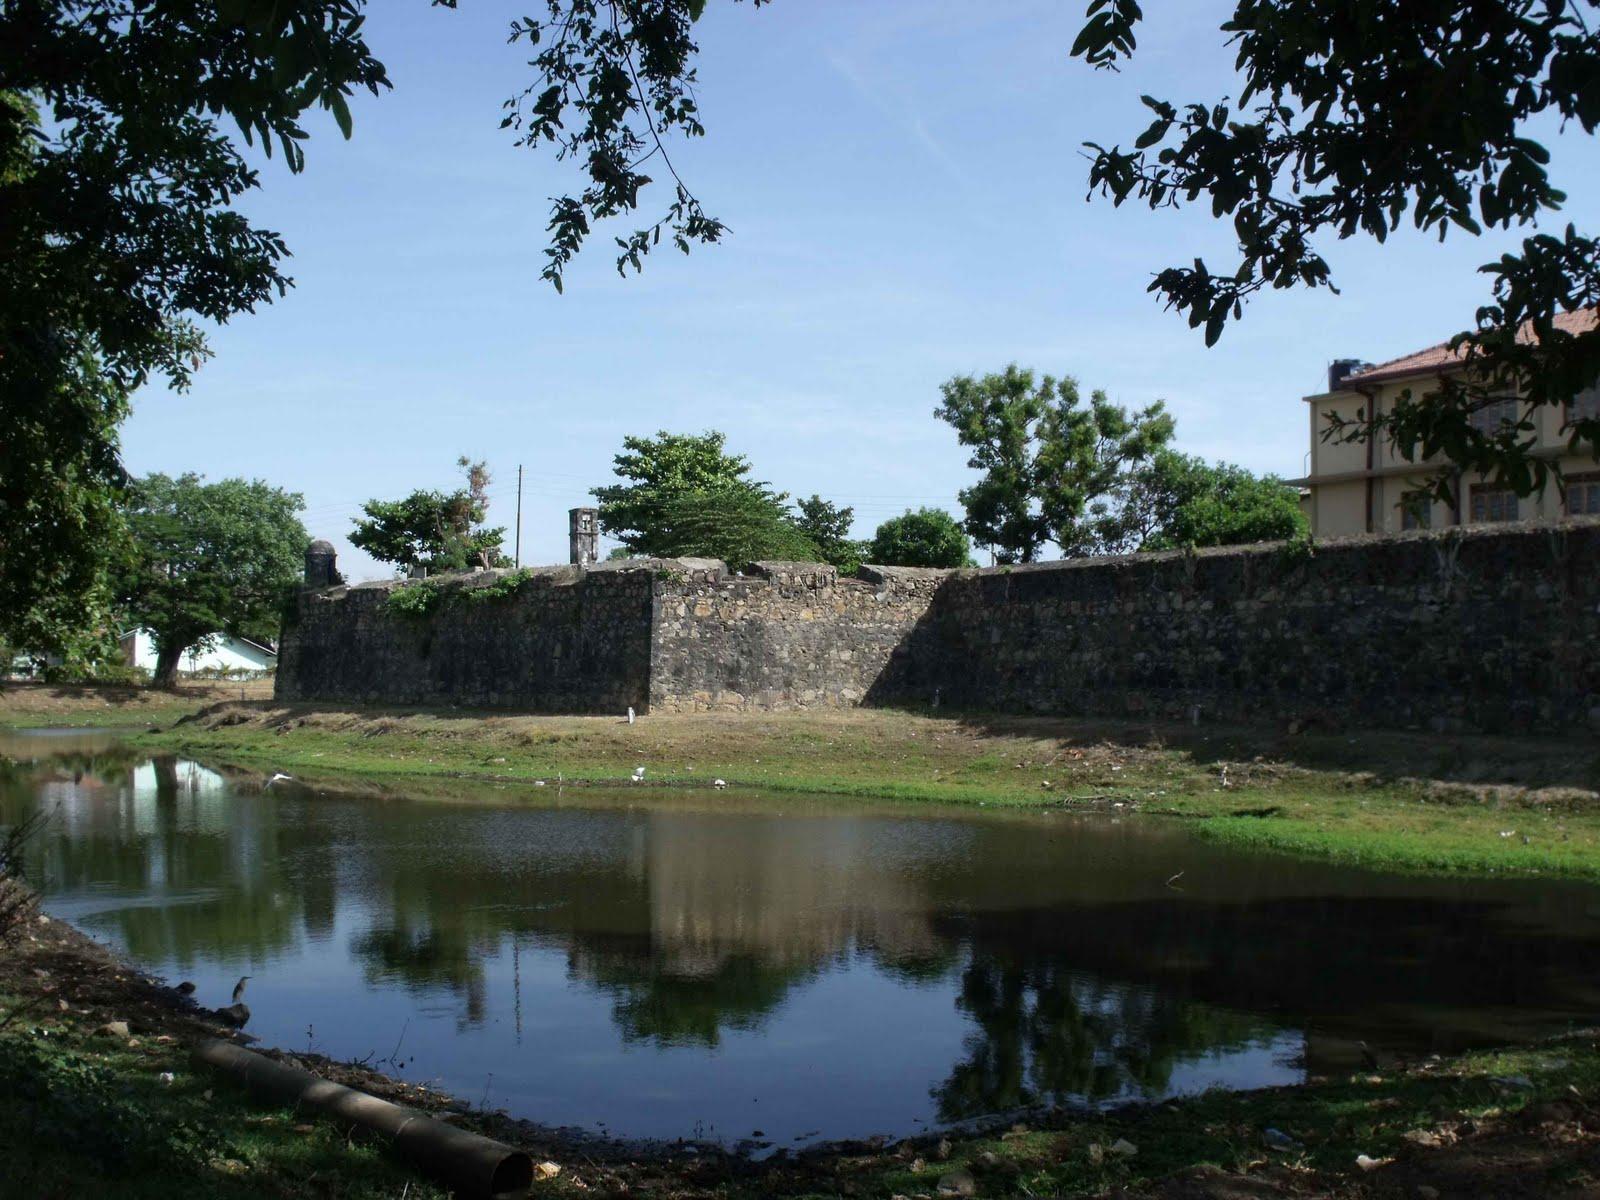 Batticaloa Sri Lanka  city images : ... of Sri Lanka on blogspot.com: Old Dutch Fort, Batticaloa, Sri Lanka